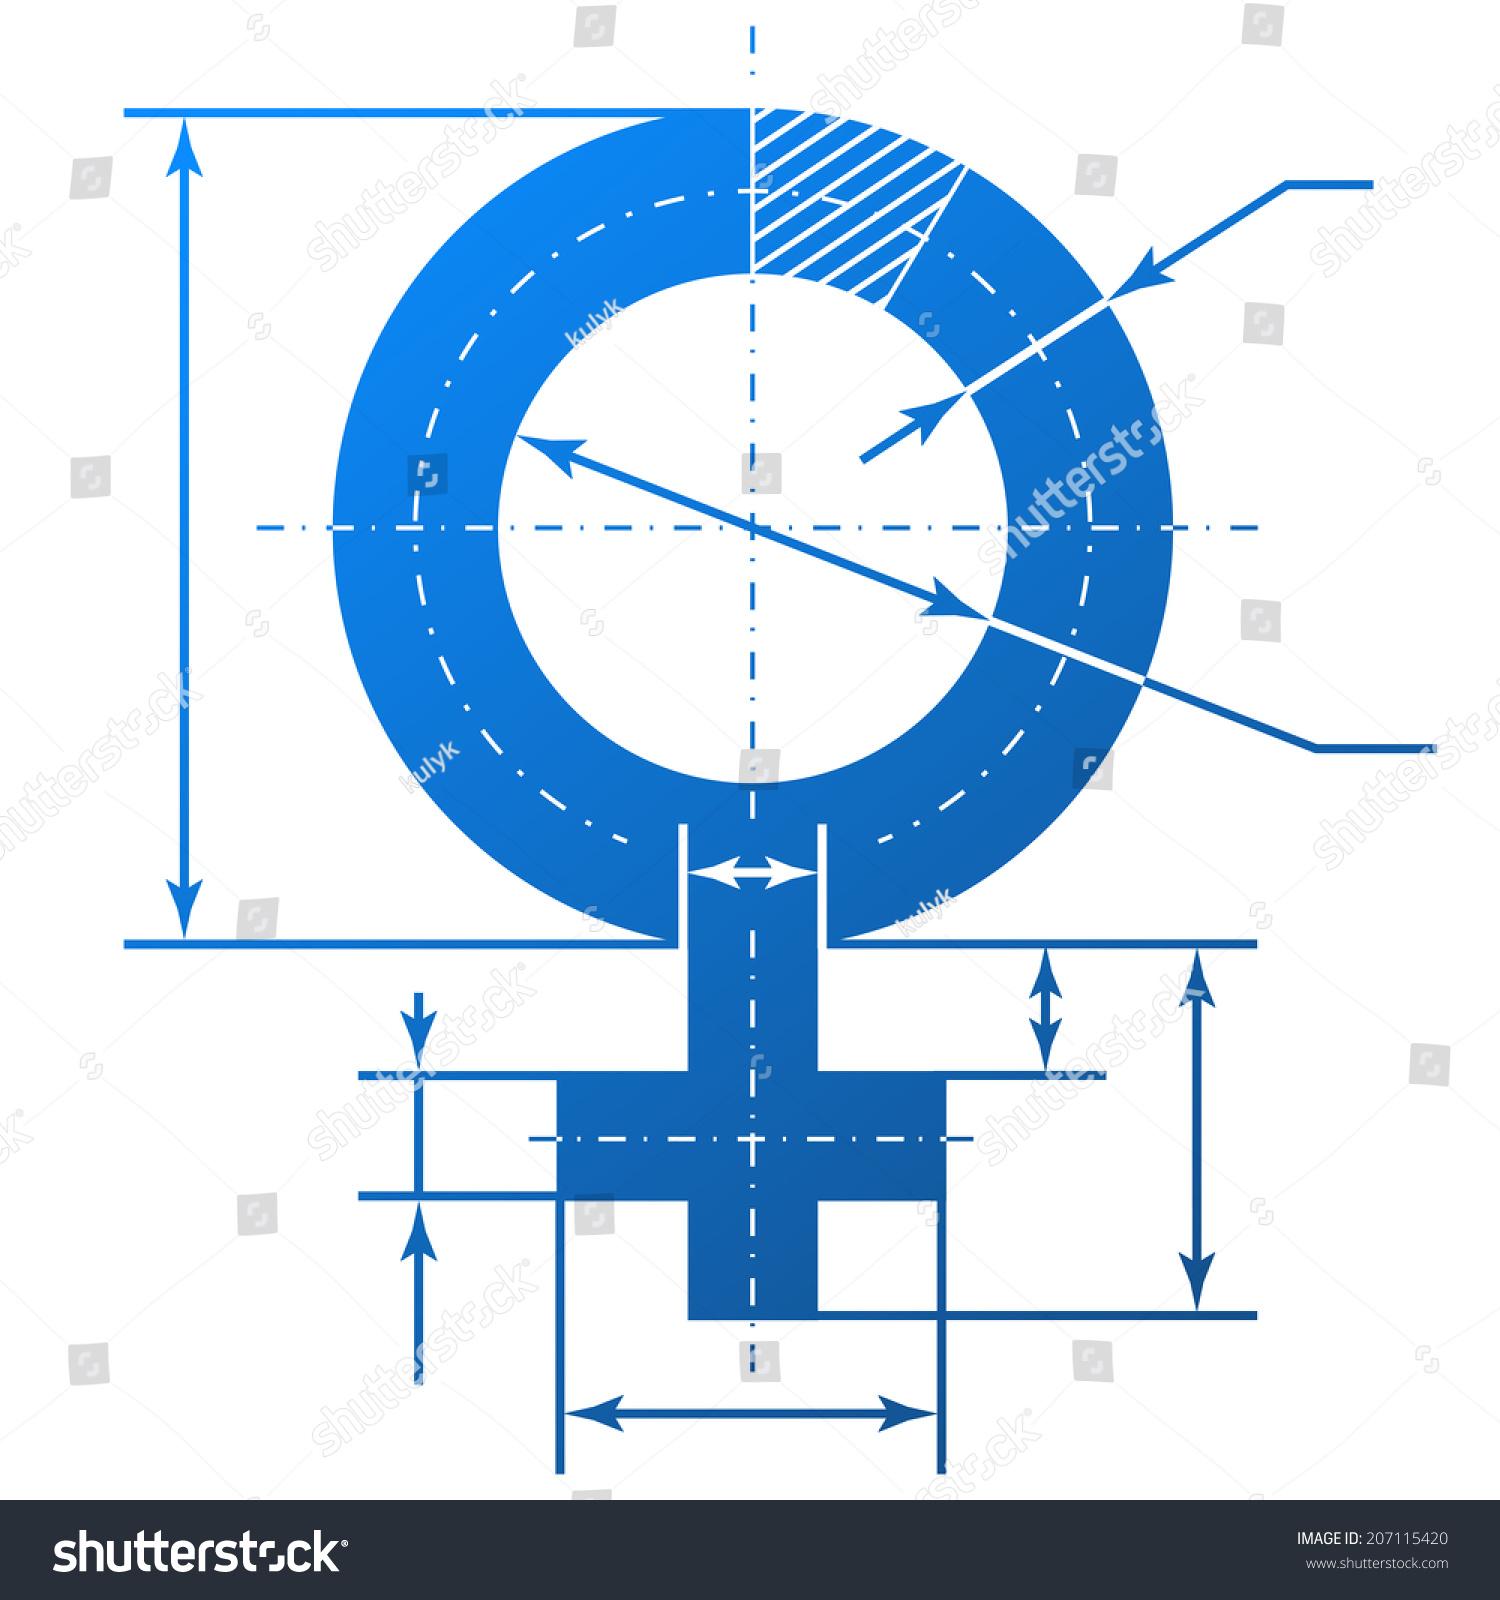 Drawing Lines Between Html Elements : Blueprint dimension symbols